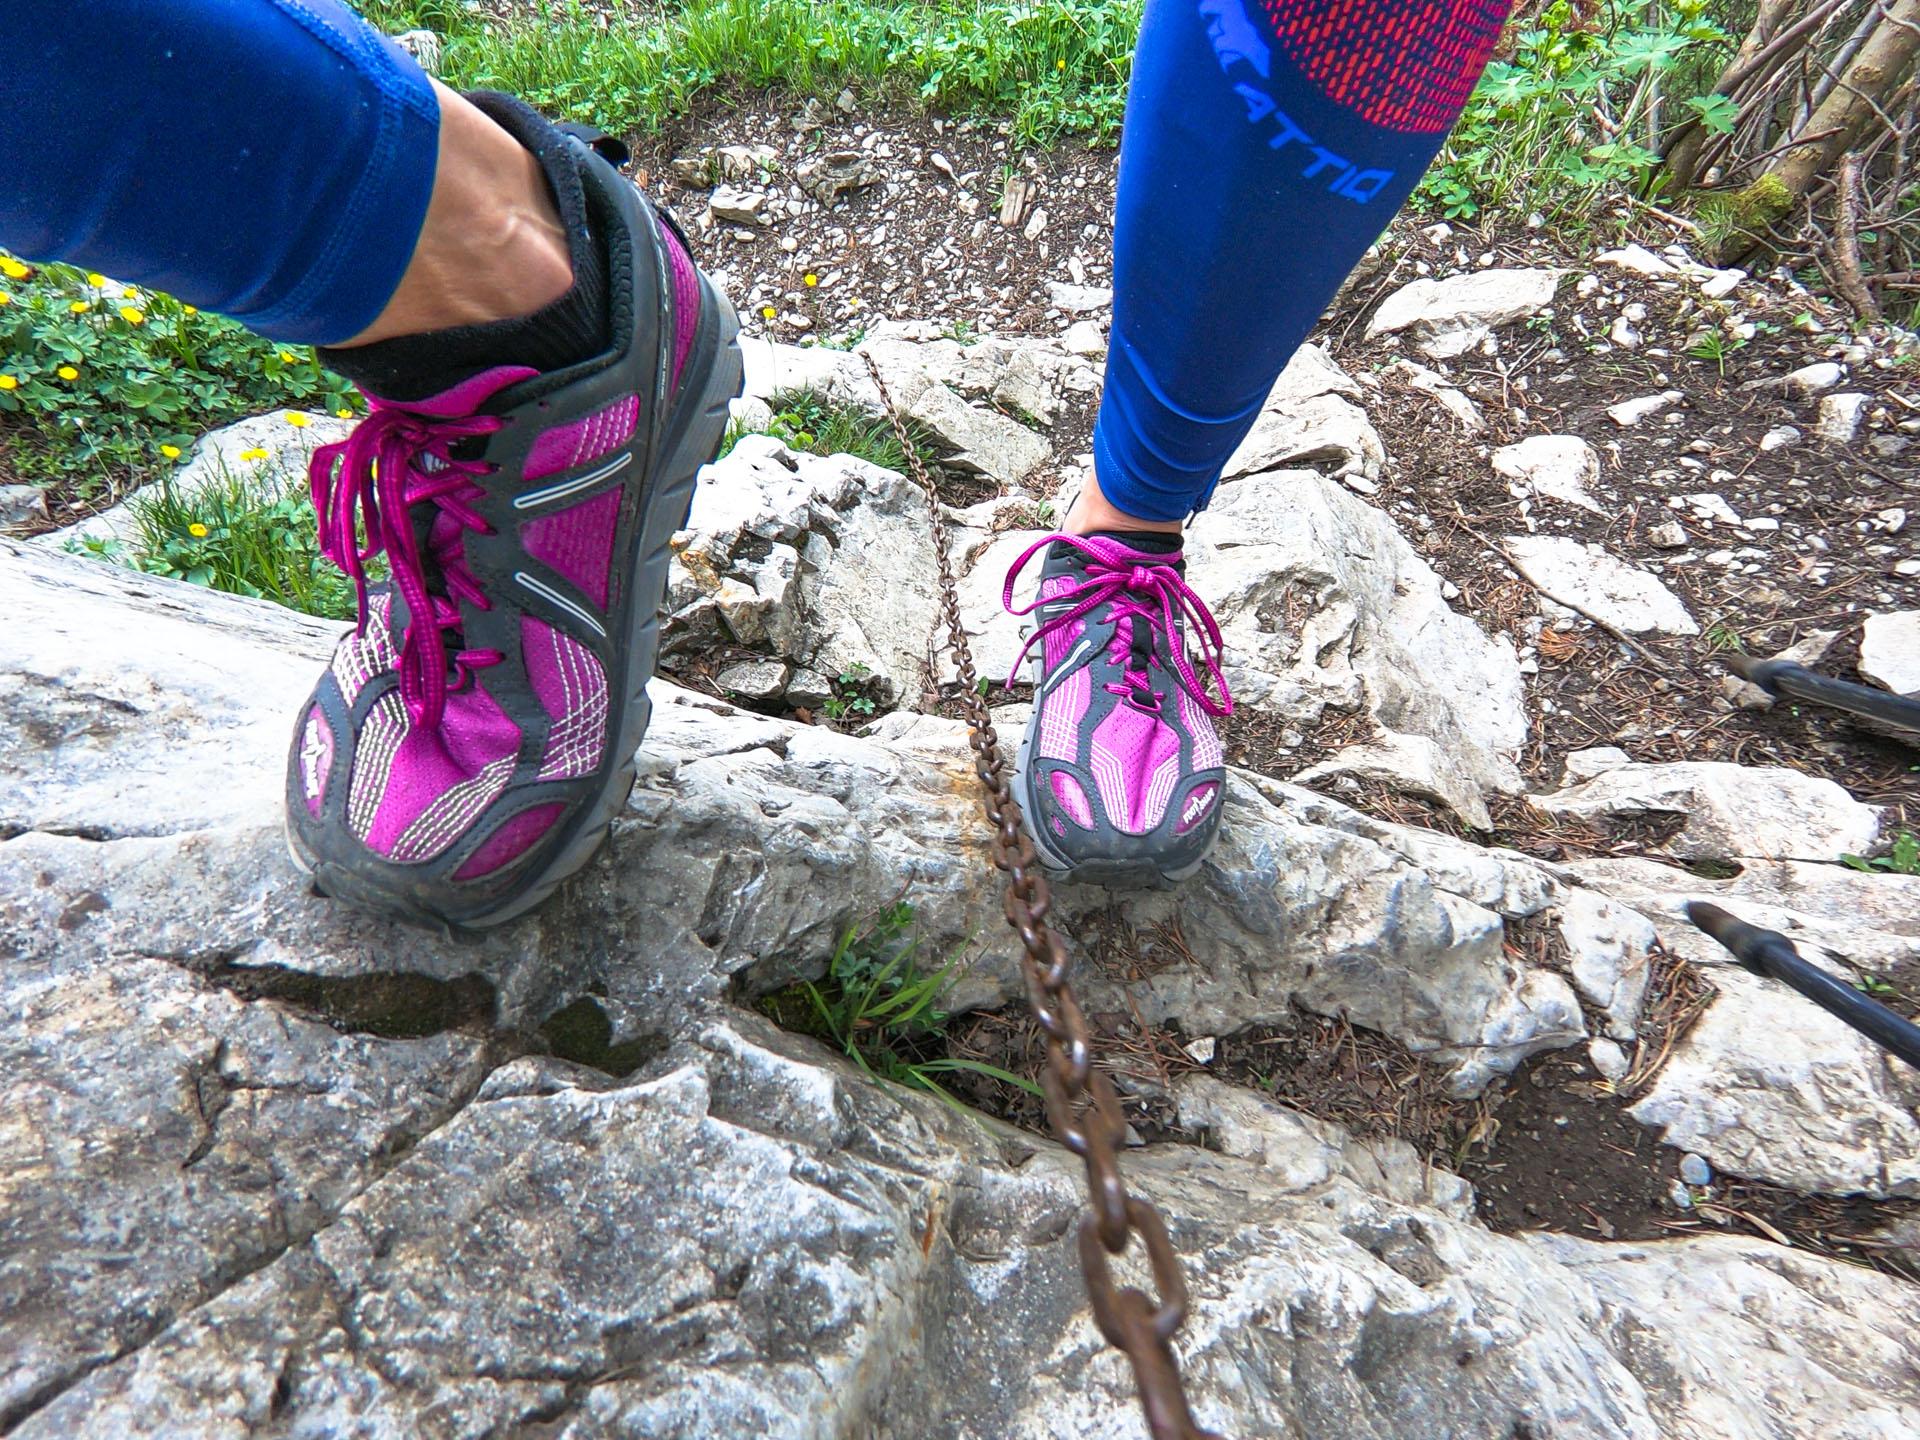 Altra Lone Peak 3.5 buty trailowe - recenzja